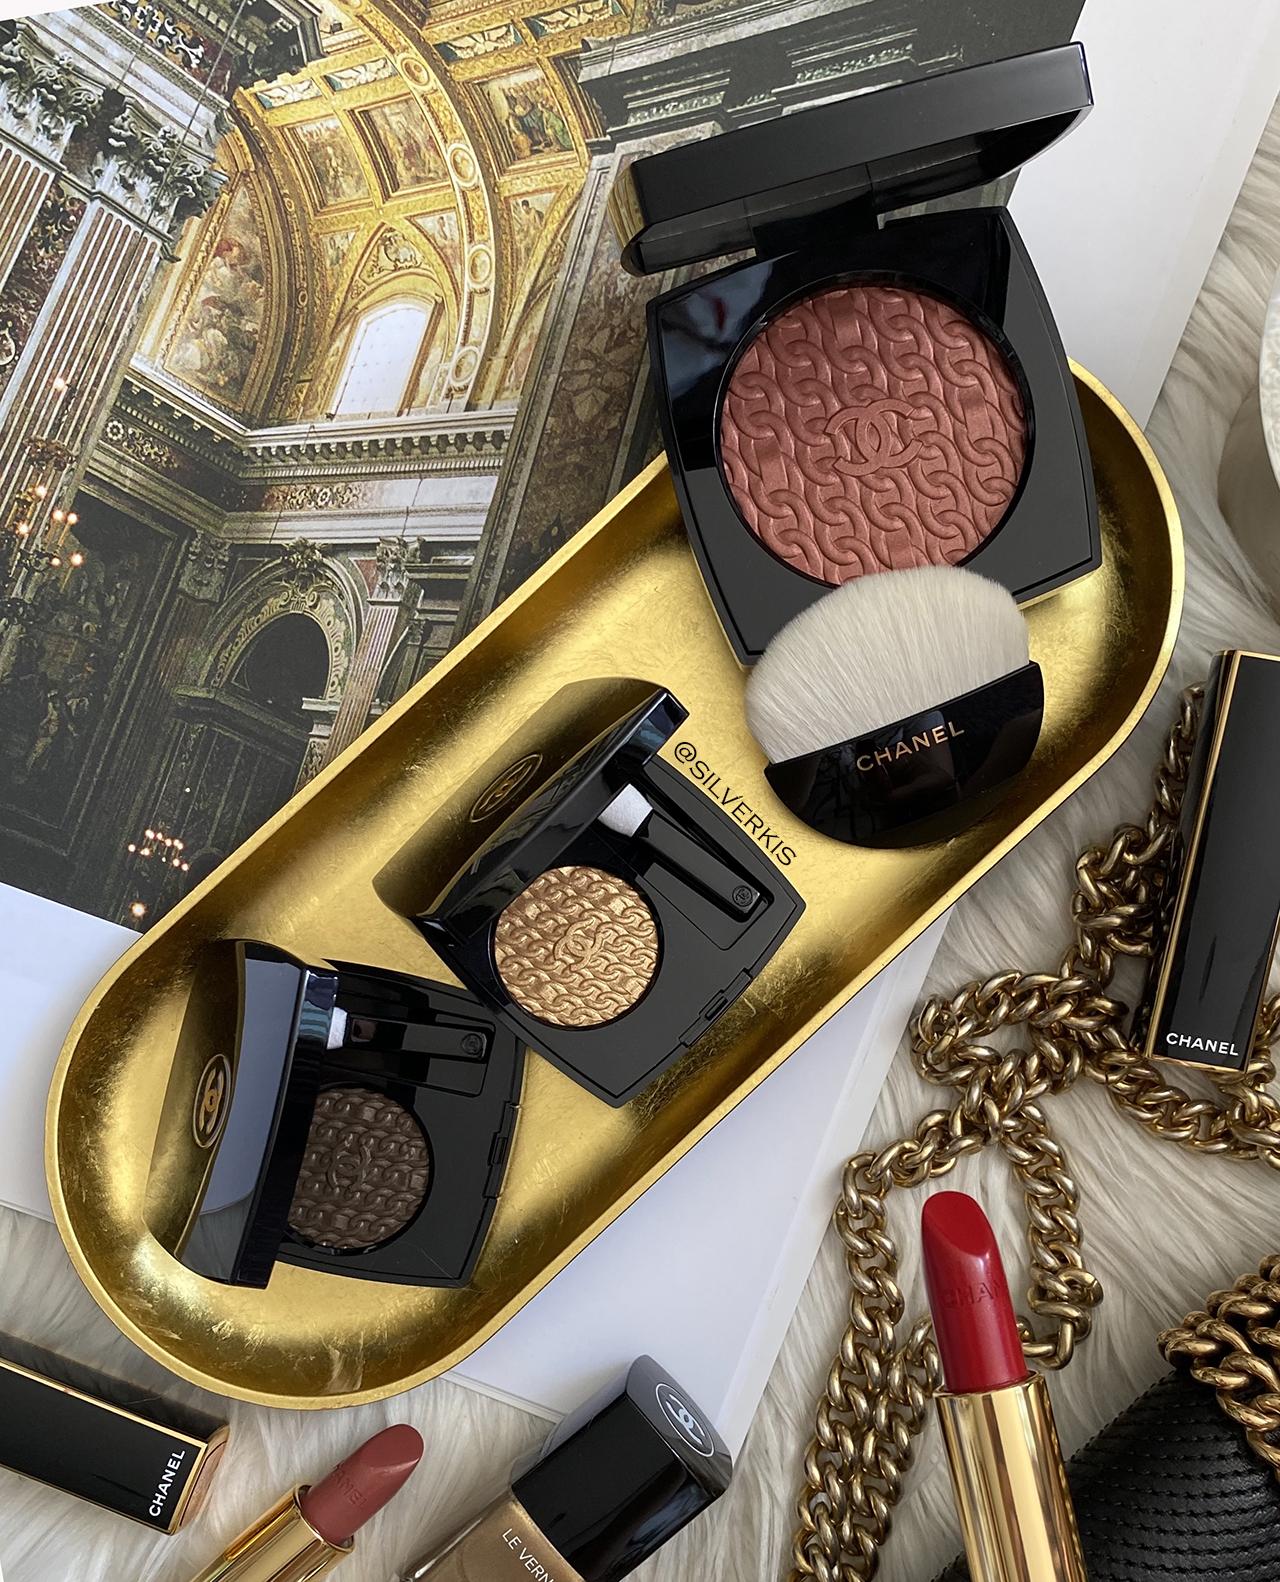 Chanel Les Chaines D'or Ombre Premiere & Poudre Blush Illuminatrice